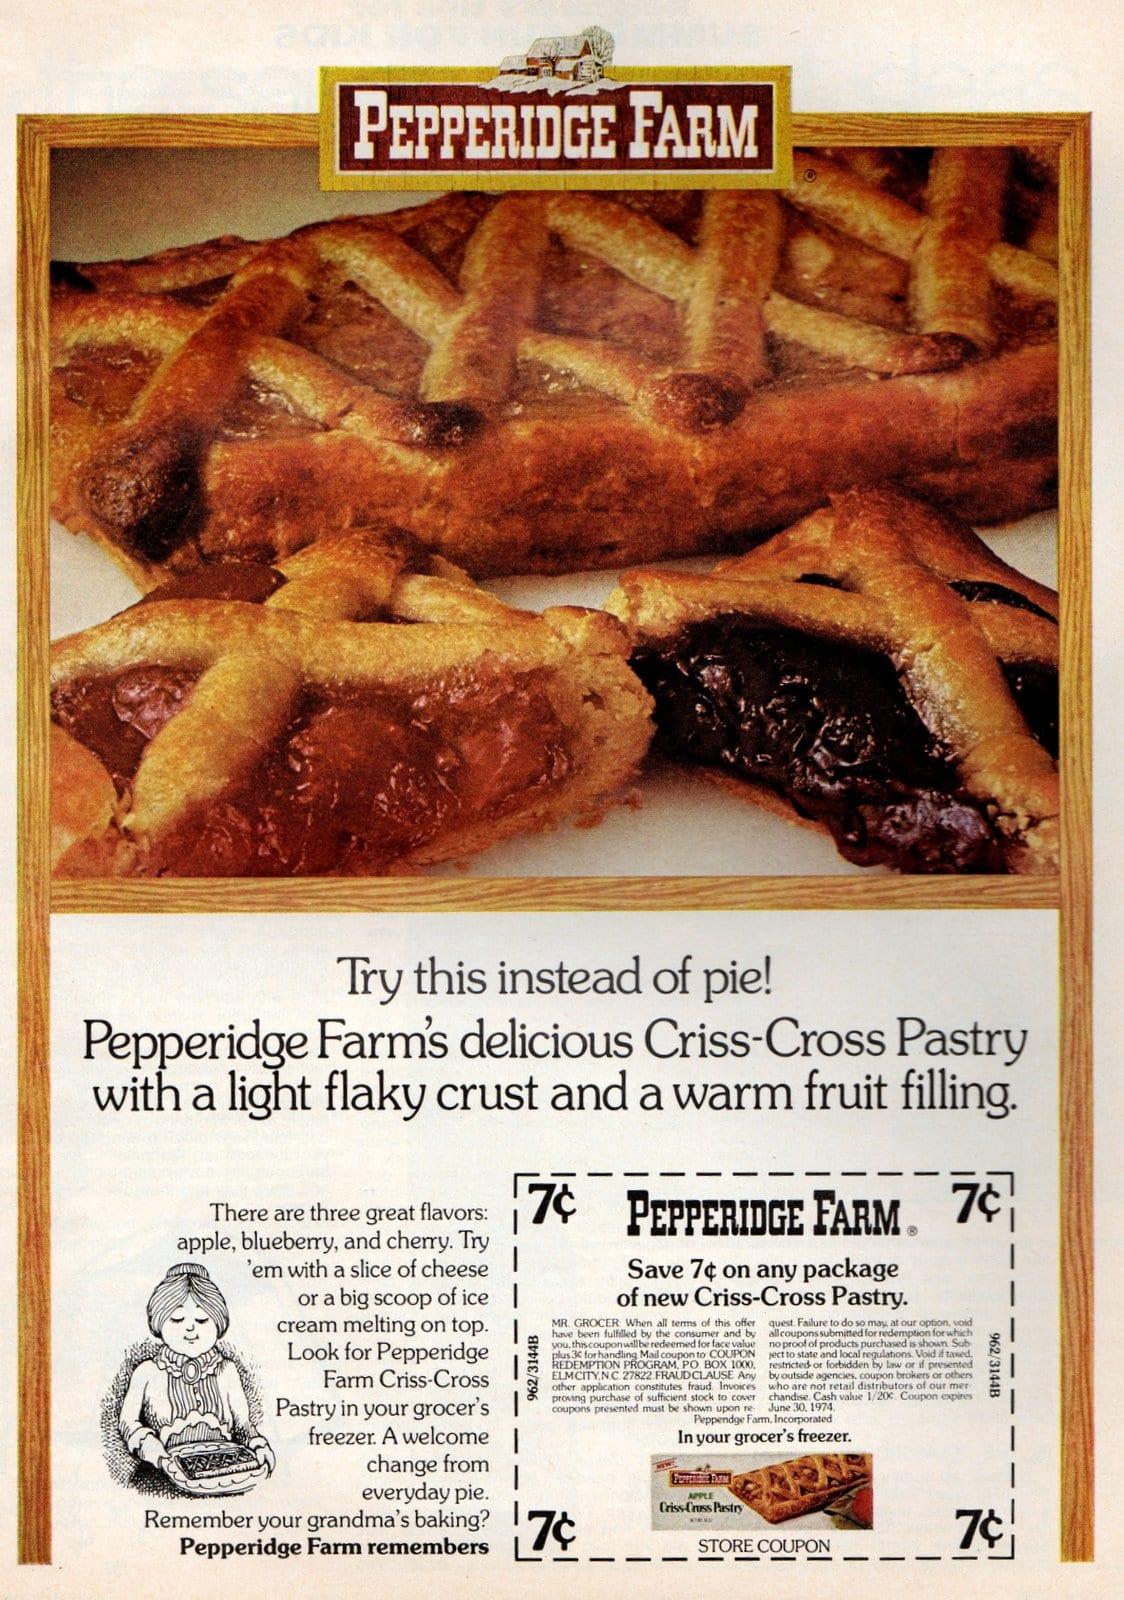 Pepperidge Farm Criss-Cross Pastry 1973